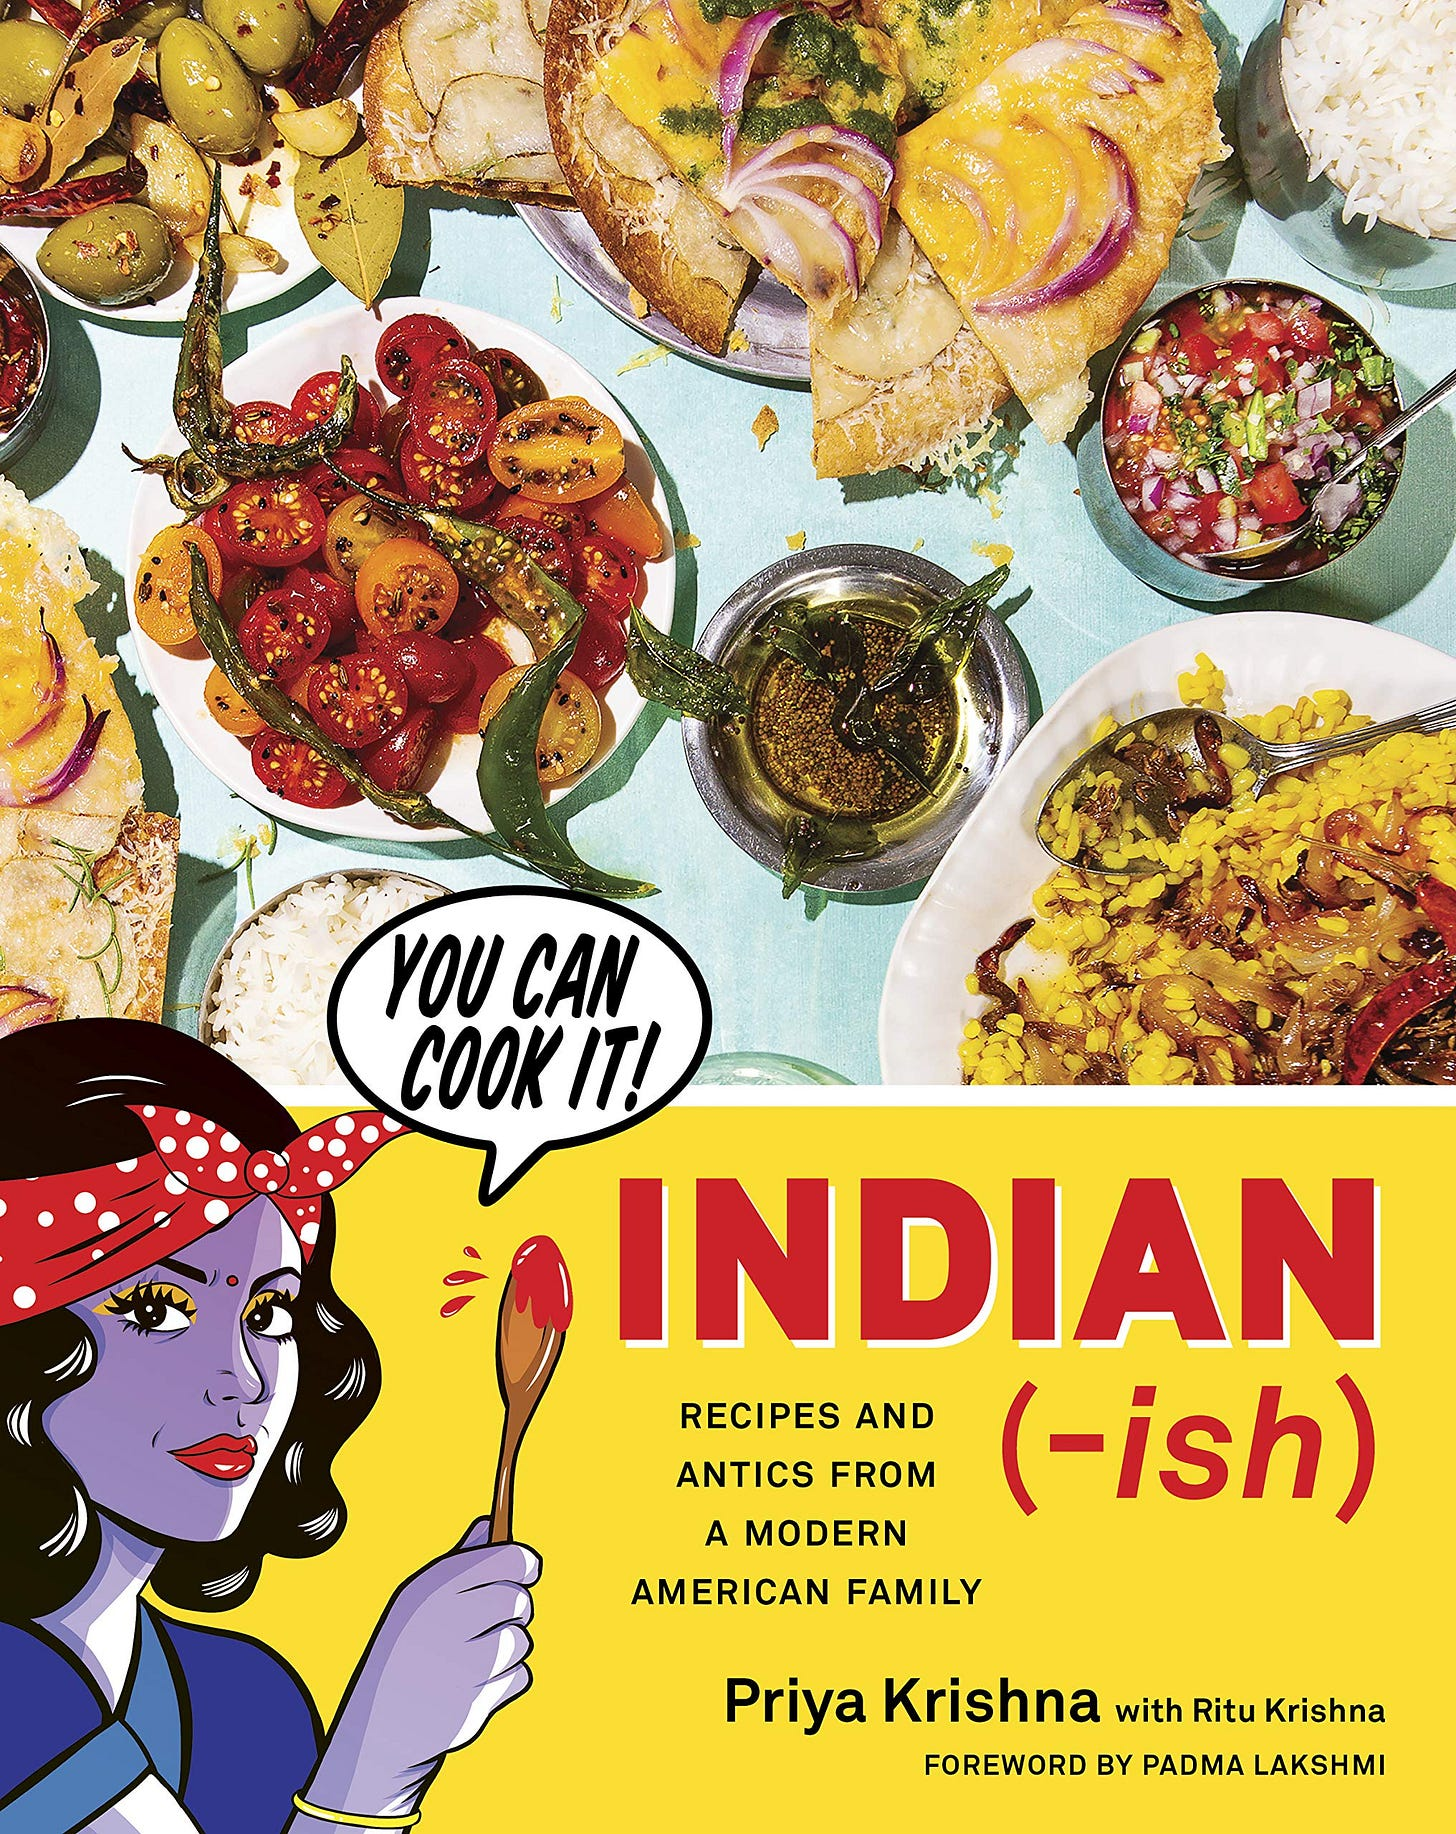 Indian-ish: Recipes and Antics from a Modern American Family: Krishna, Priya,  Kelley, Mackenzie: 9781328482471: Books - Amazon.ca